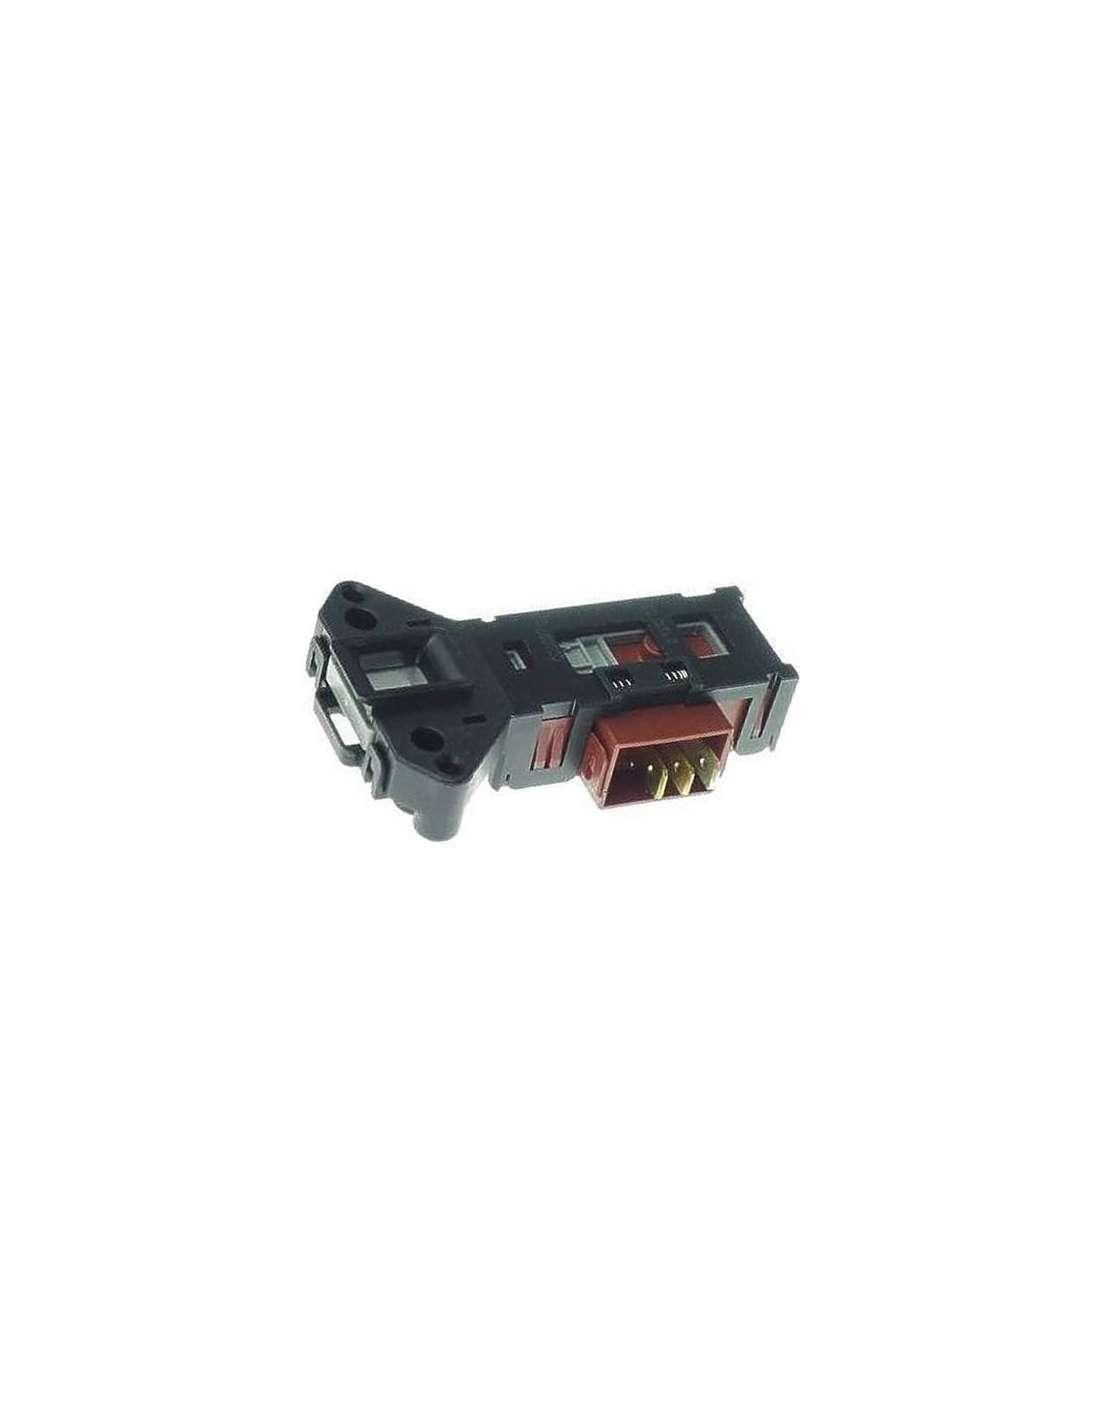 Termo electrico ariston simat80 barato 80 litros termo - Termo electrico pequeno ...